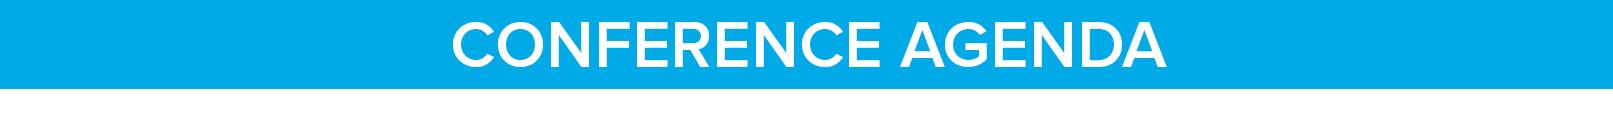 TitleBars_ConferenceAgenda.jpg